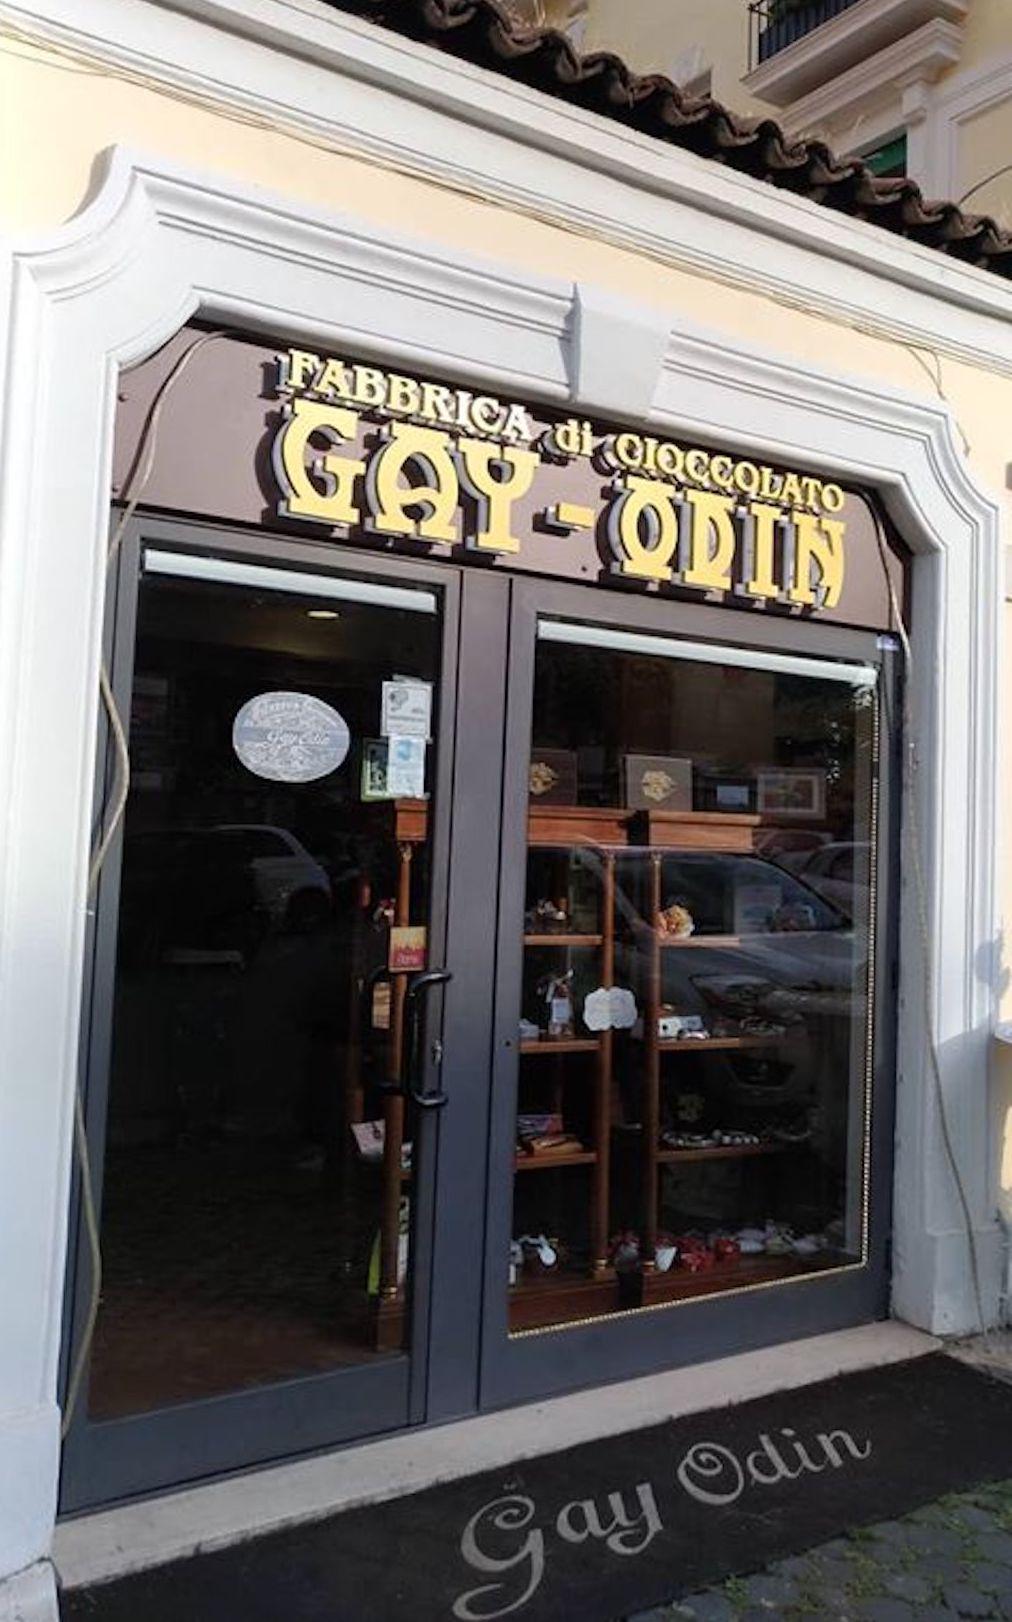 Gay-Odin-ingresso